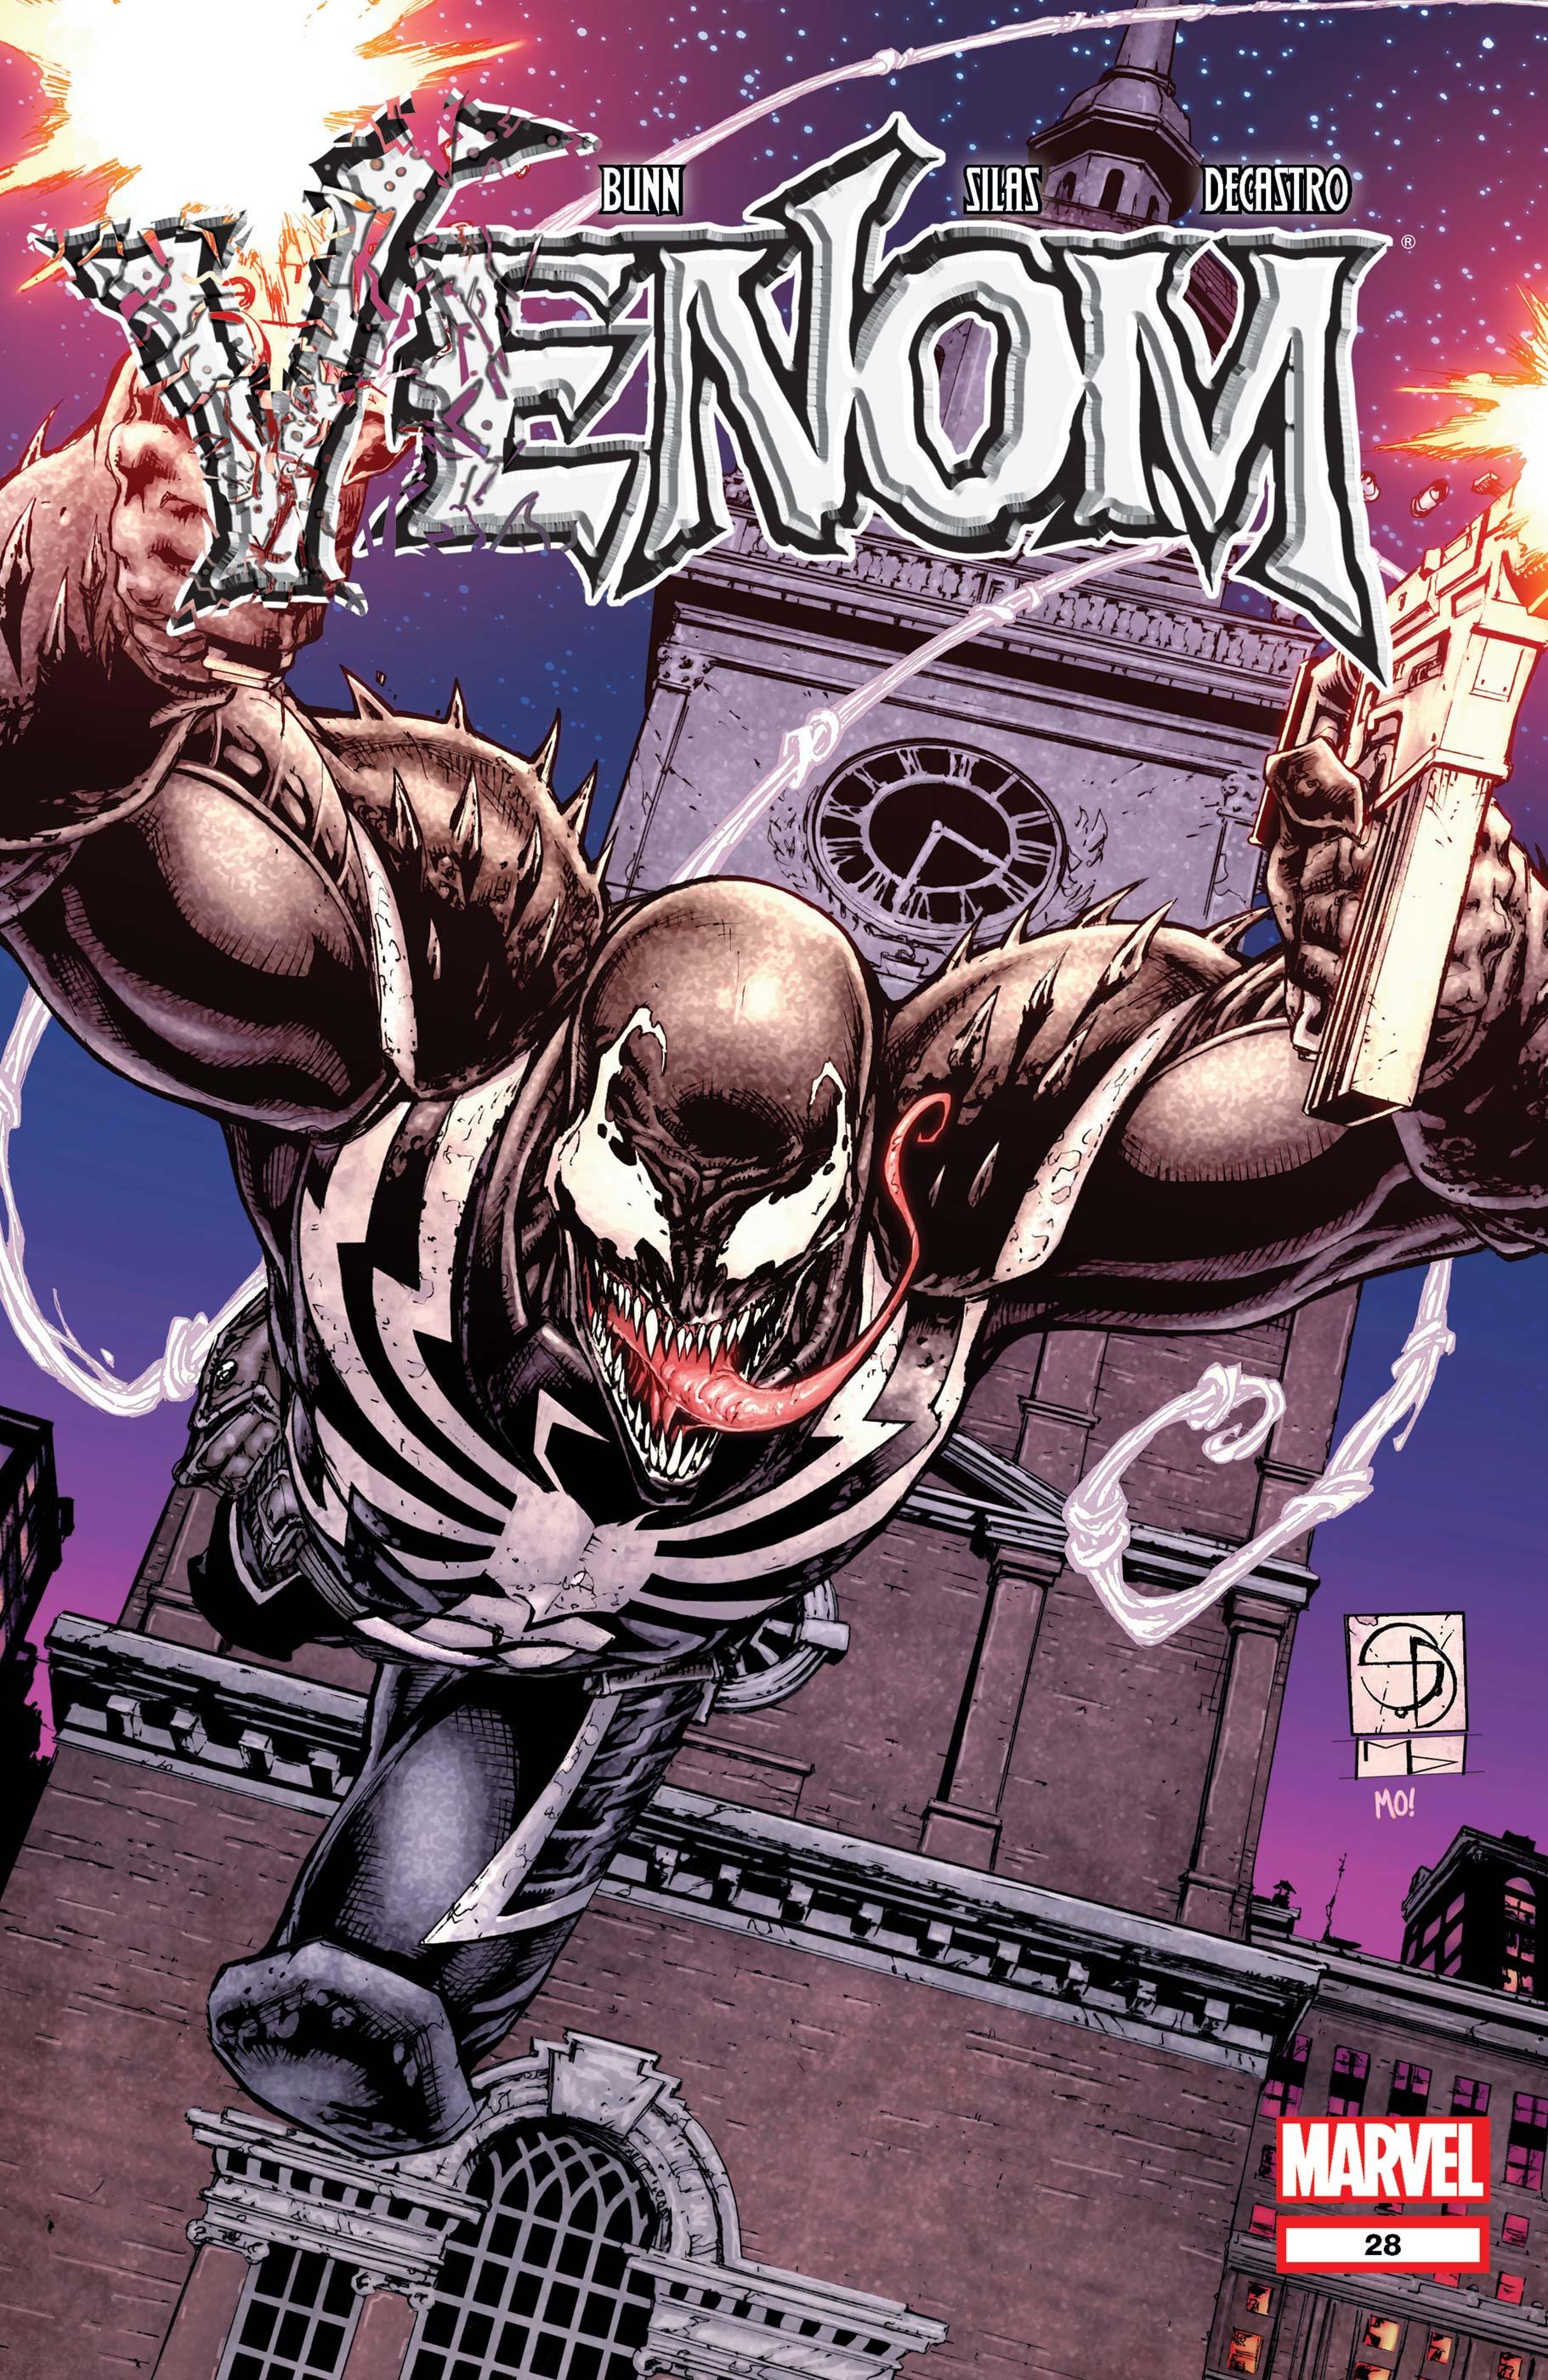 Venom (2011) #28